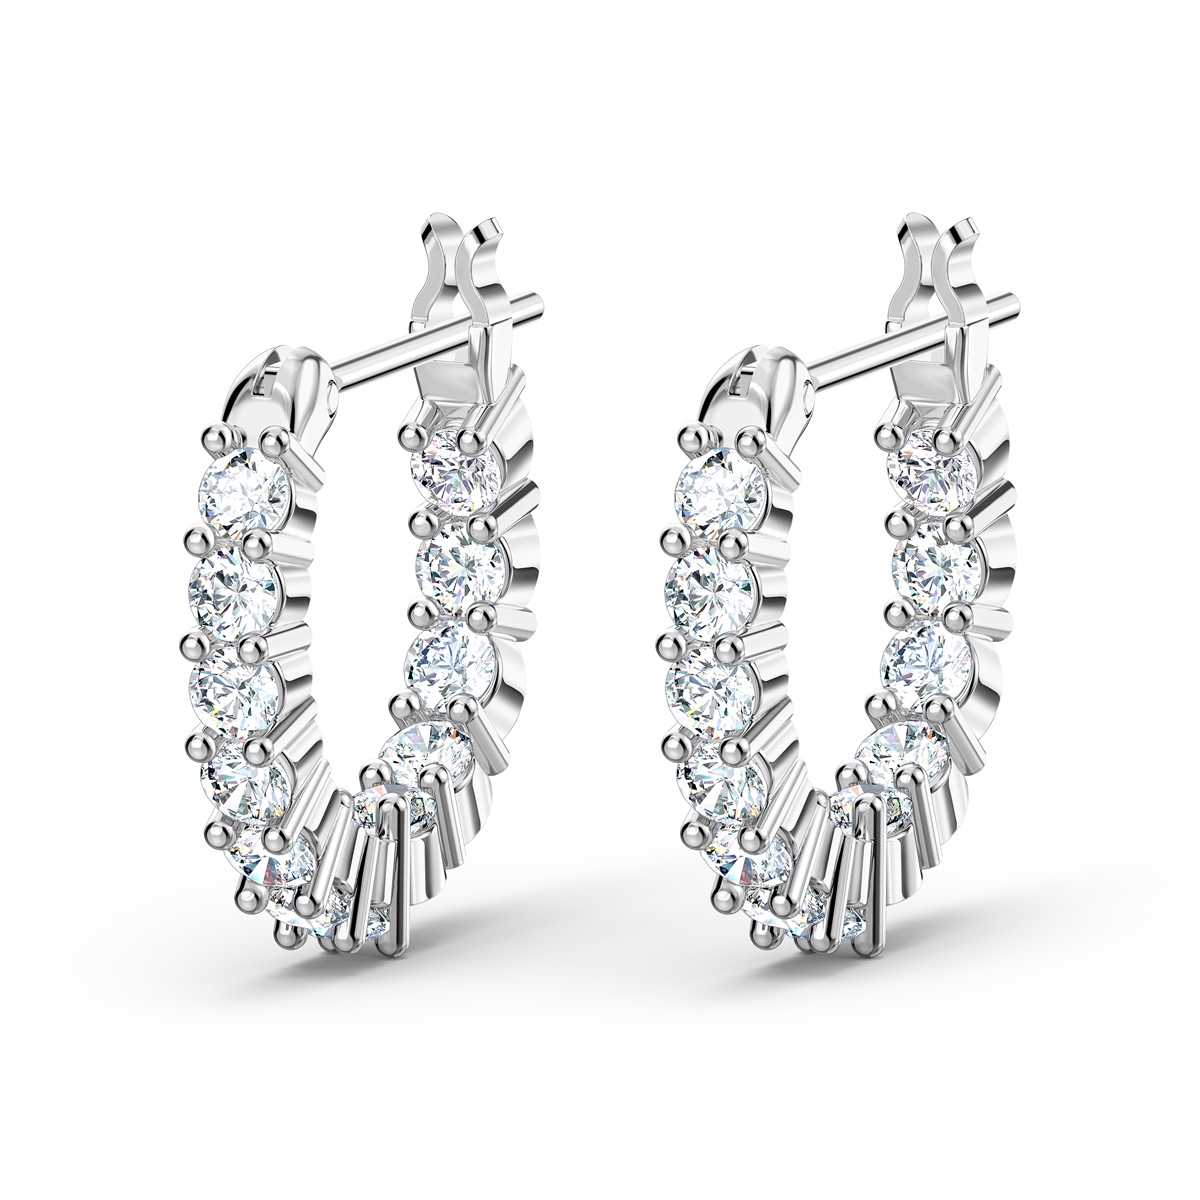 Swarovski Vittore Mini Hoop Pierced Earrings, White, Rhodium Plated